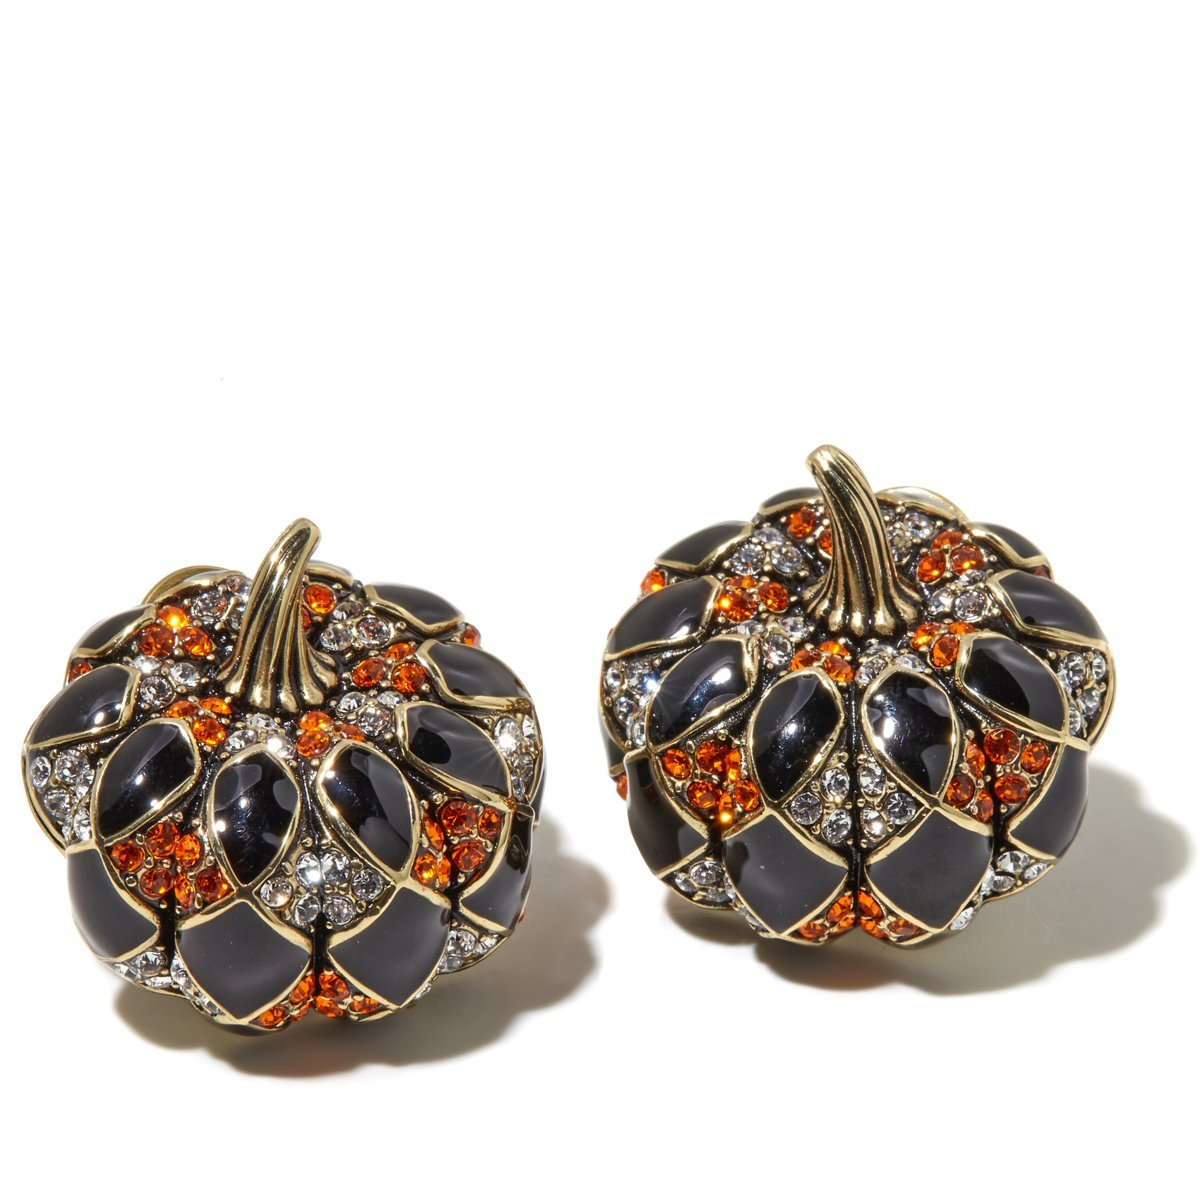 Heidi Daus Harlequin Pumpkin Earrings EXQUISITE SWAROVSKI GREAT CONVERSATION STARTER FOR THANKSGIVING!!!